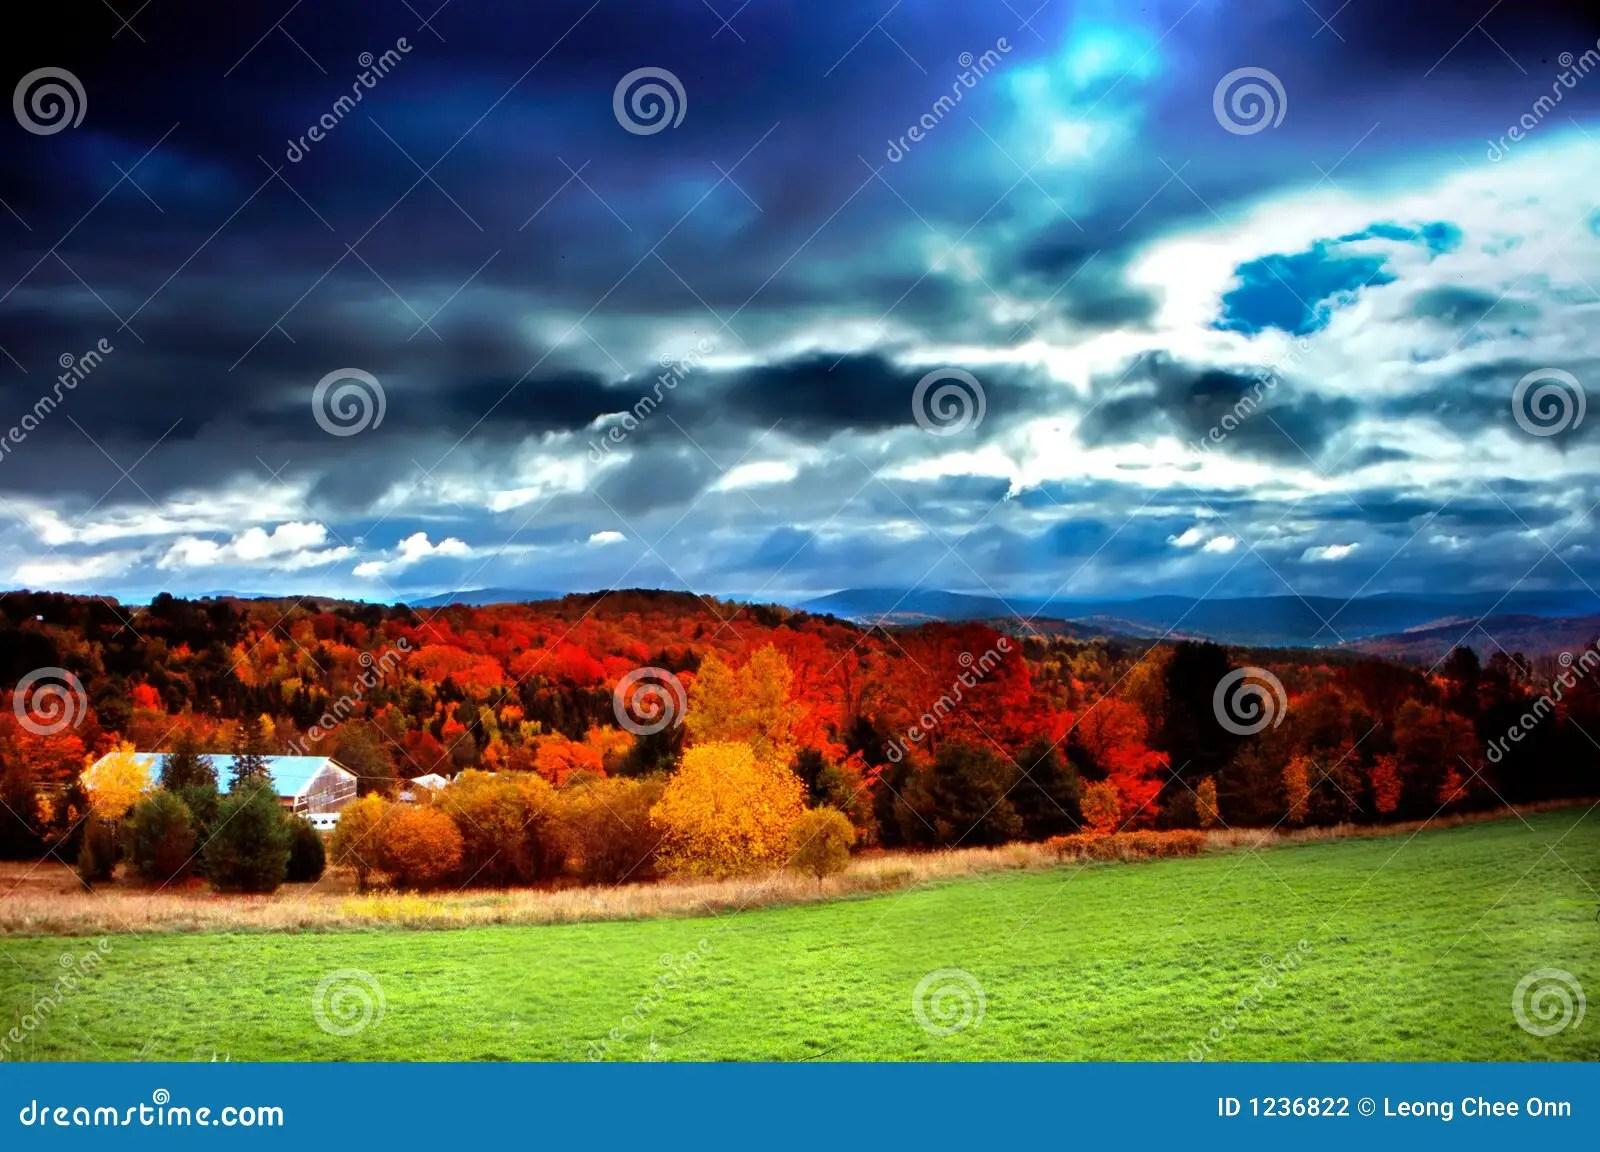 Fall Scenes Desktop Wallpaper Vermont Usa Stock Photography Image 1236822